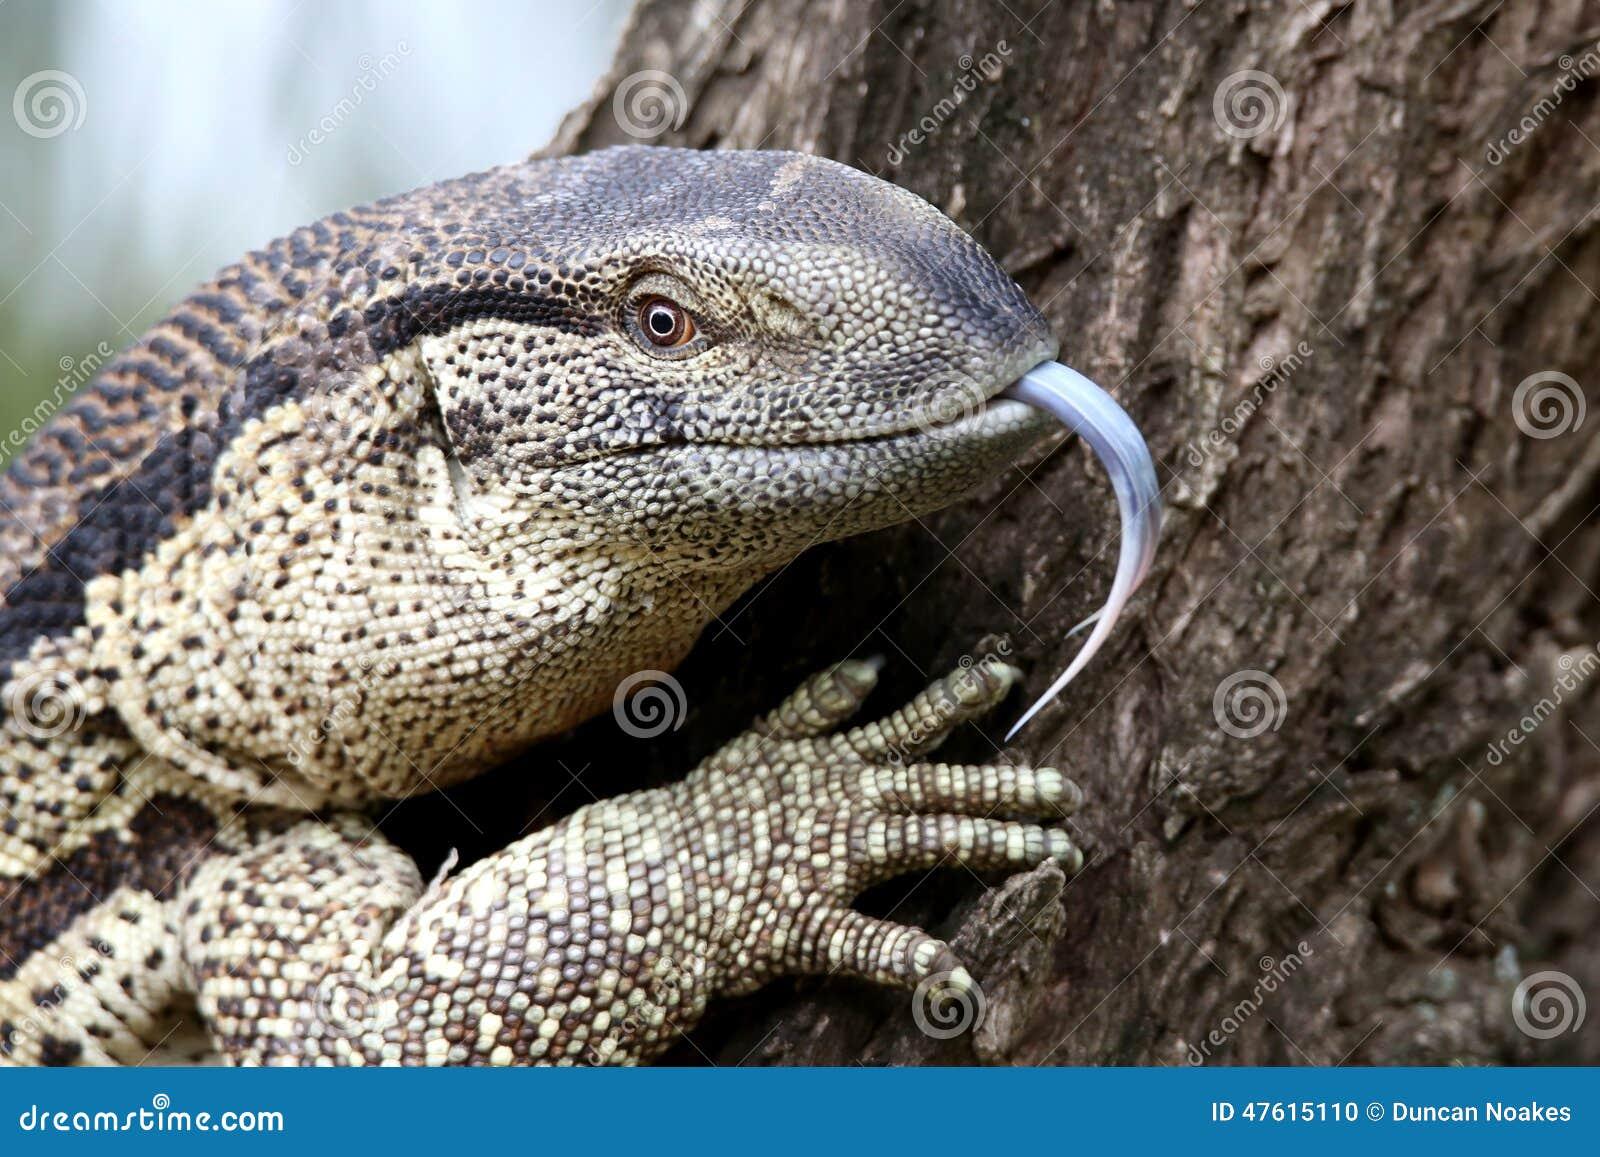 A 2 Z Reptiles Leguaan Or Water Monit...